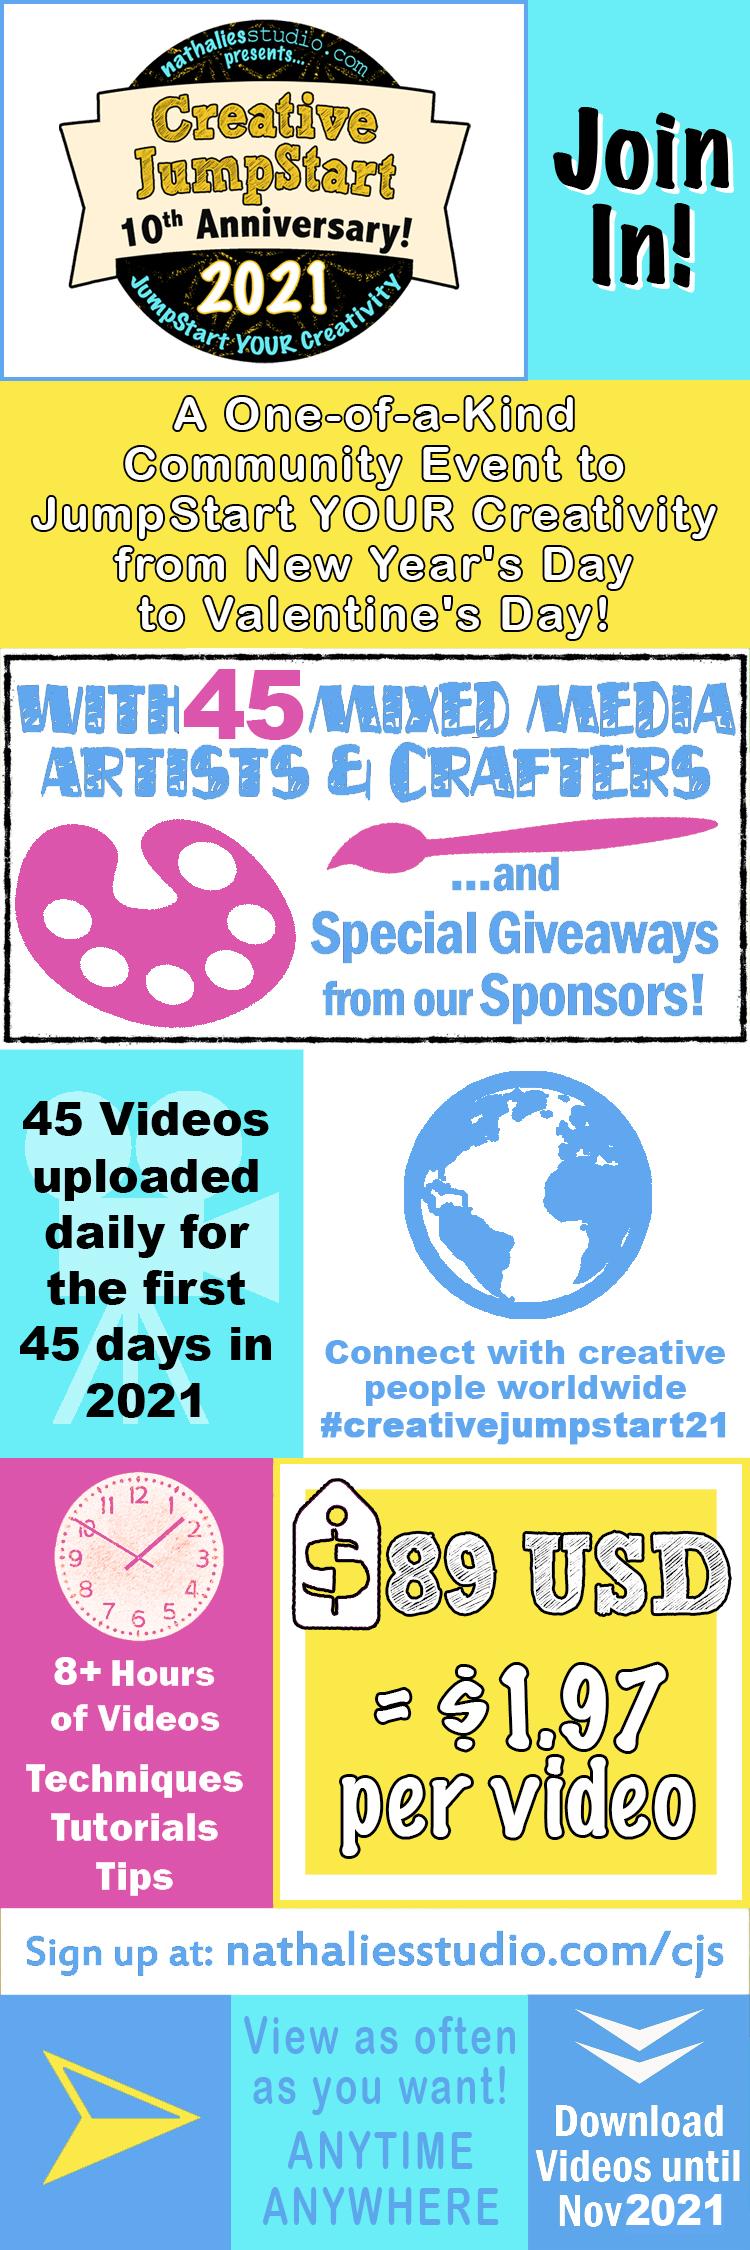 Creative JumpStart 2021 infographic